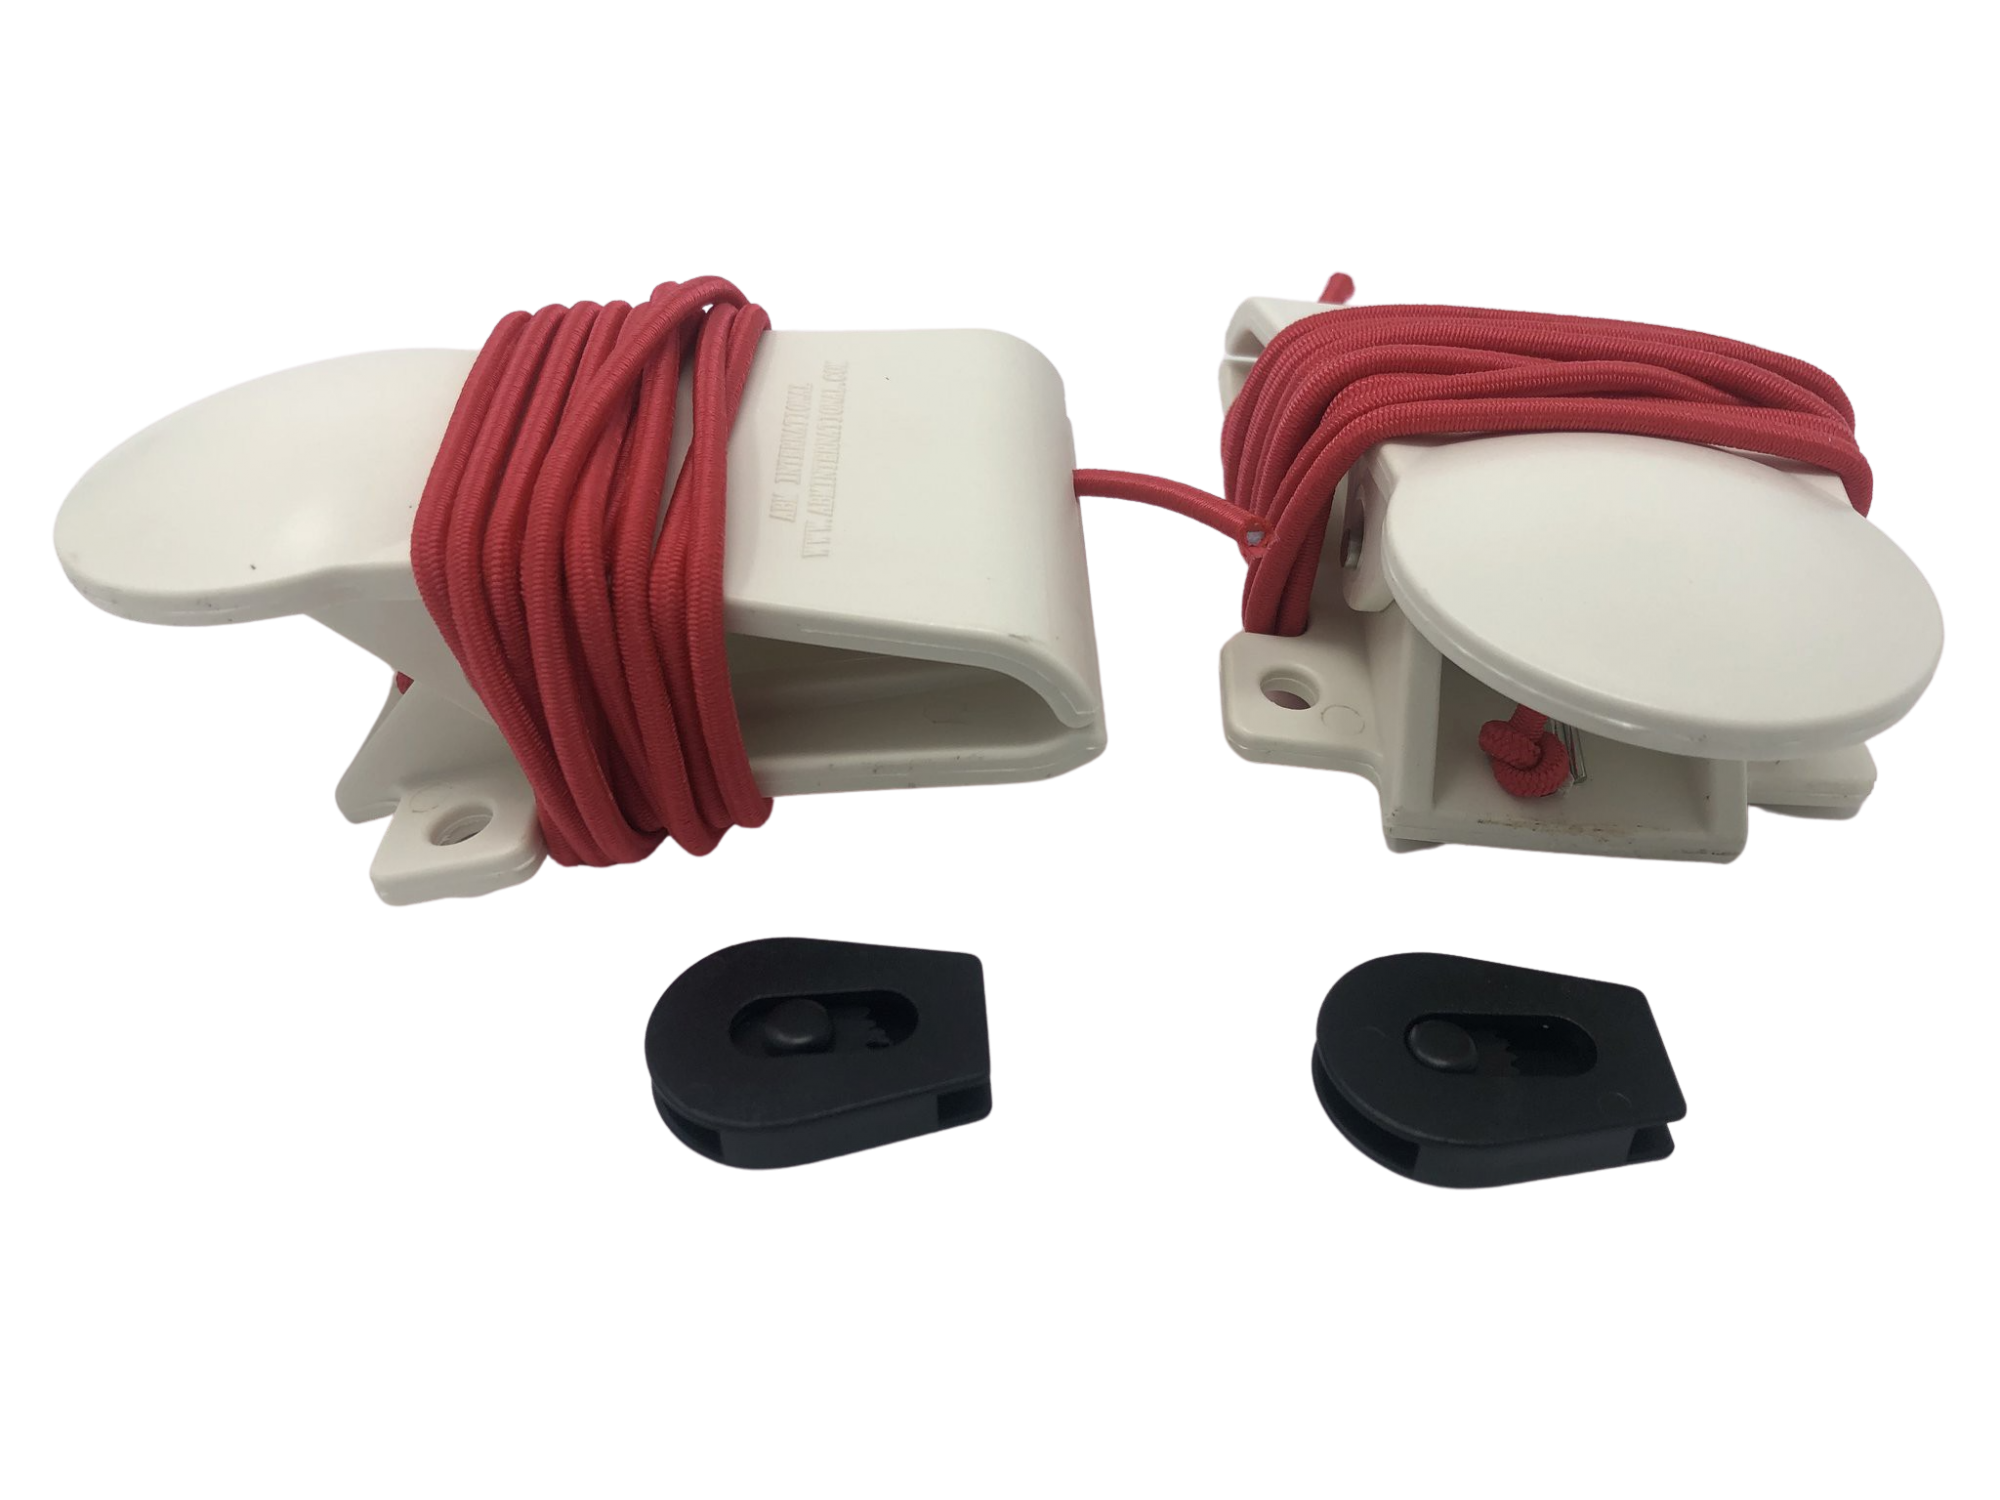 Plastic Clamp w/ Cord & Cord Lock Set